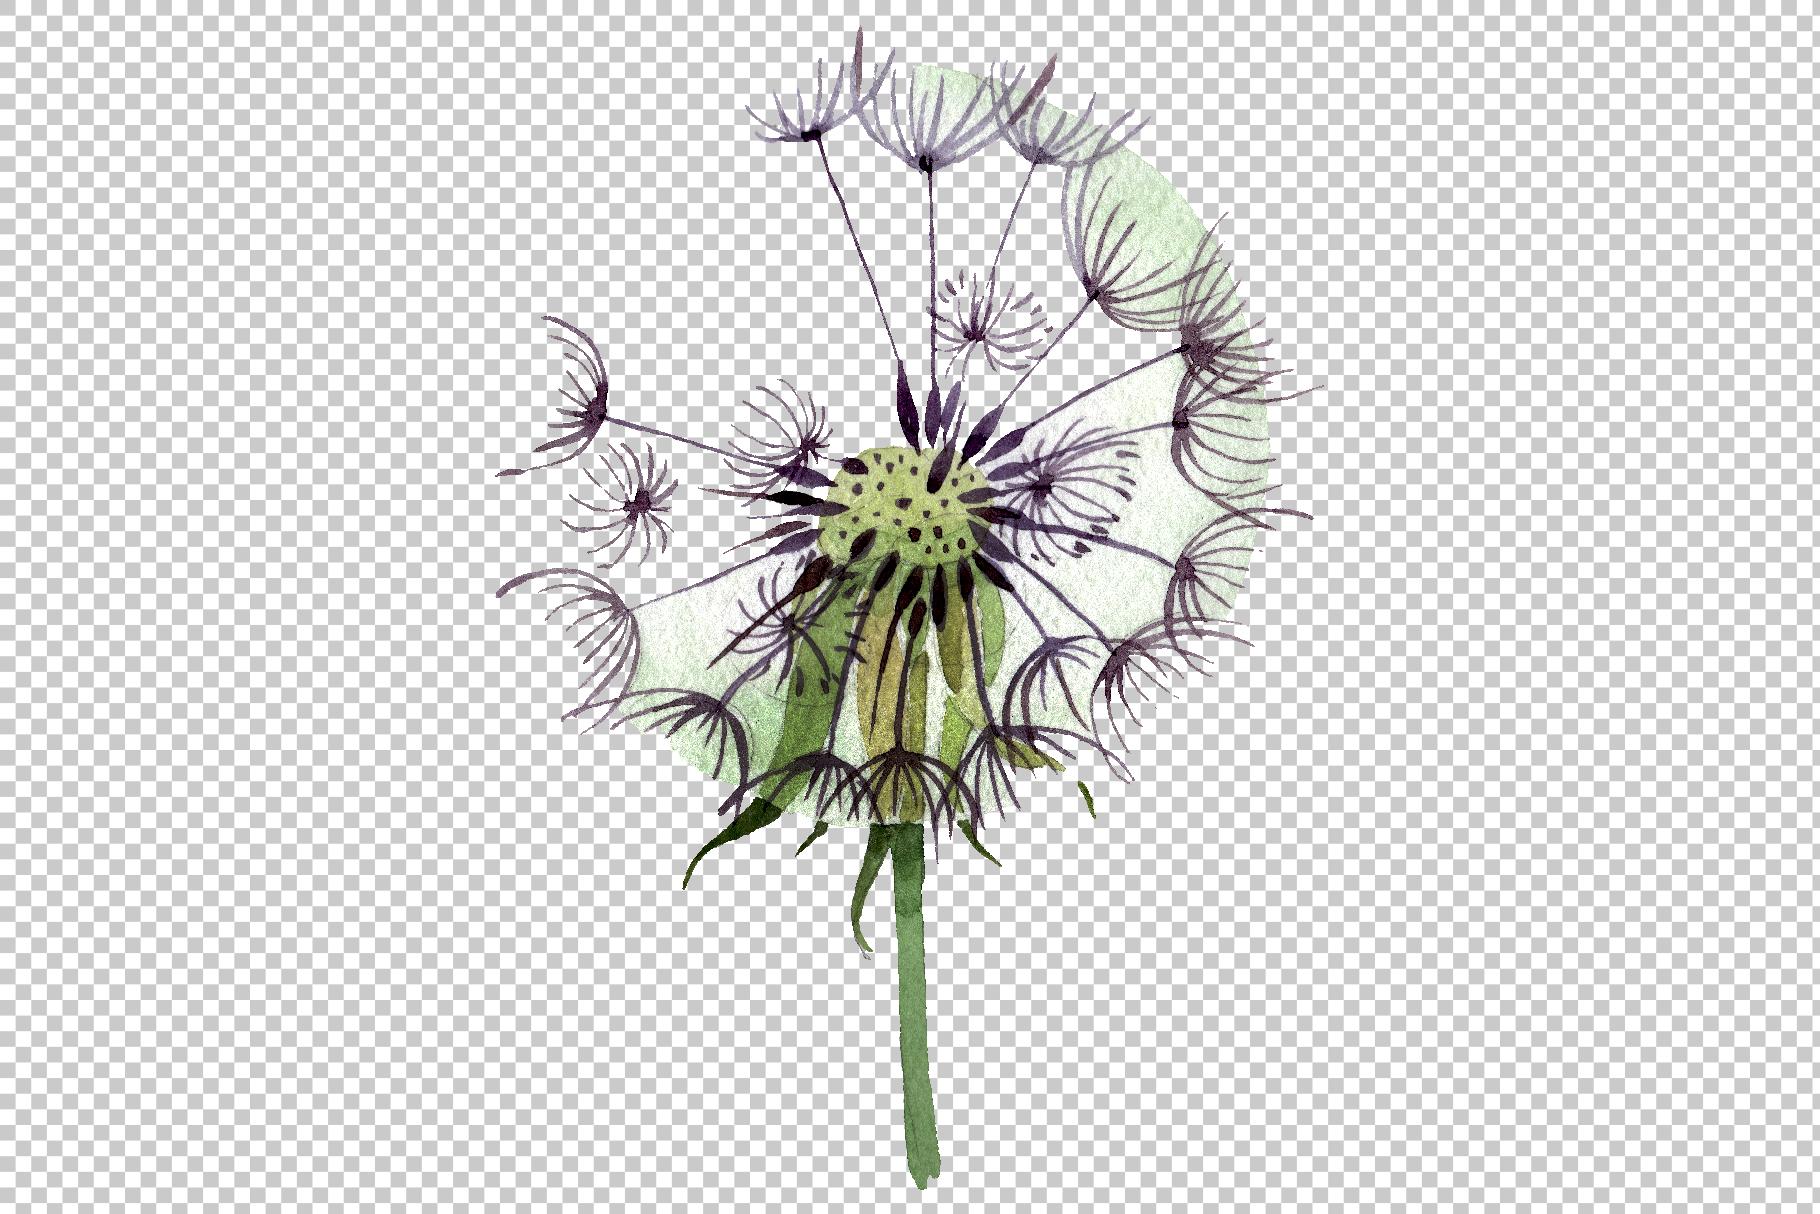 Dandelion summer greeting watercolor png example image 3